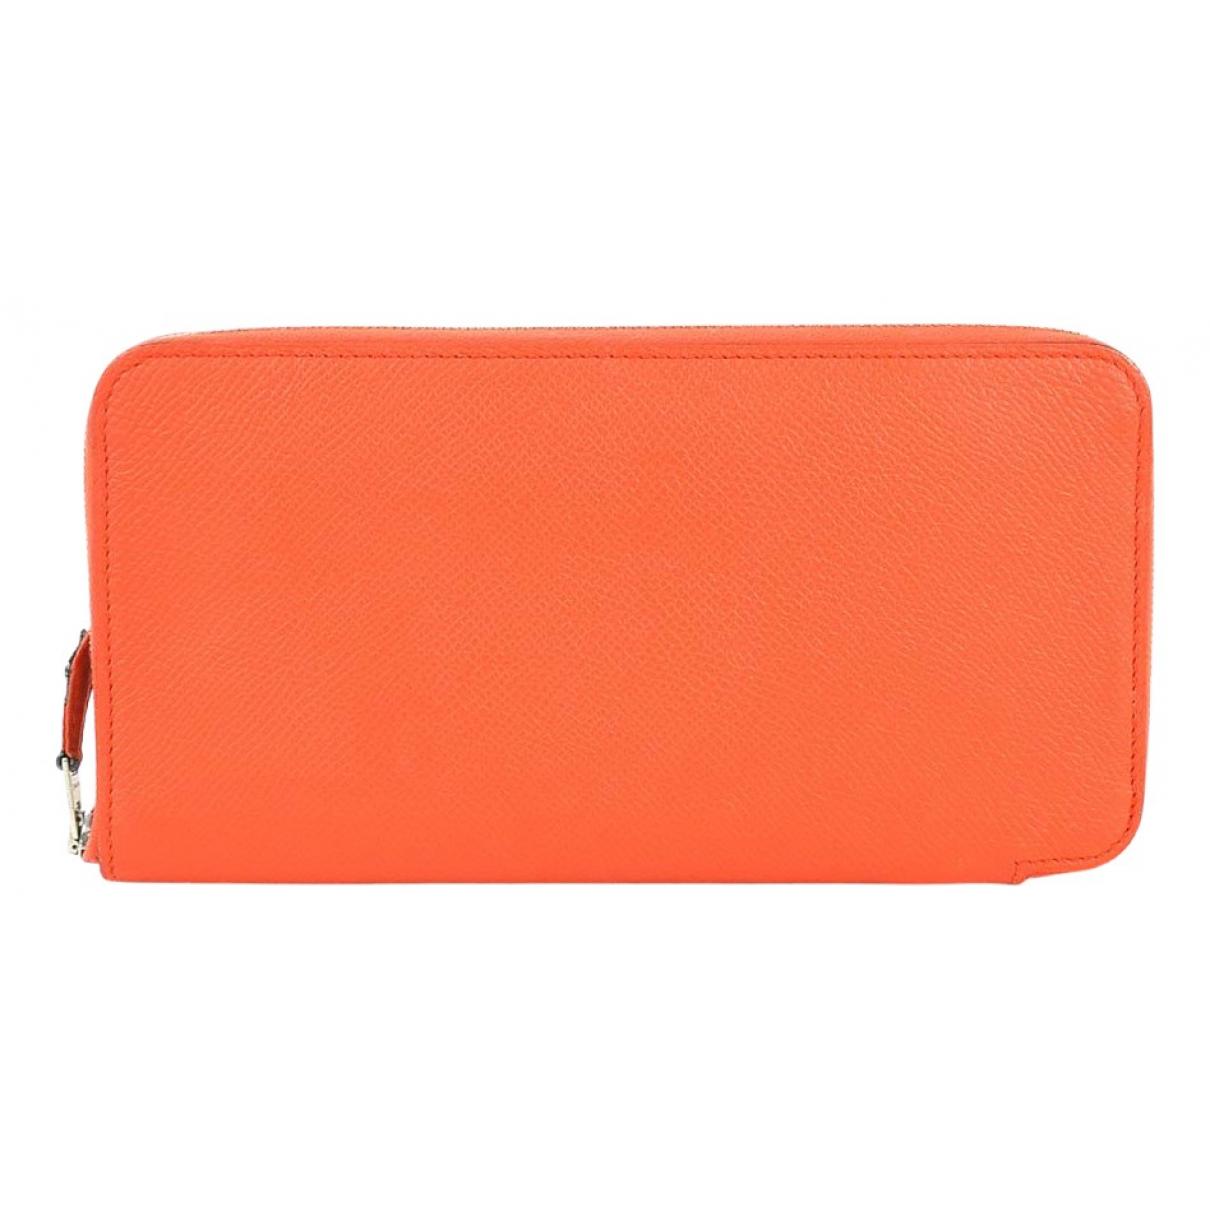 Hermes - Portefeuille Silkin pour femme en cuir - orange